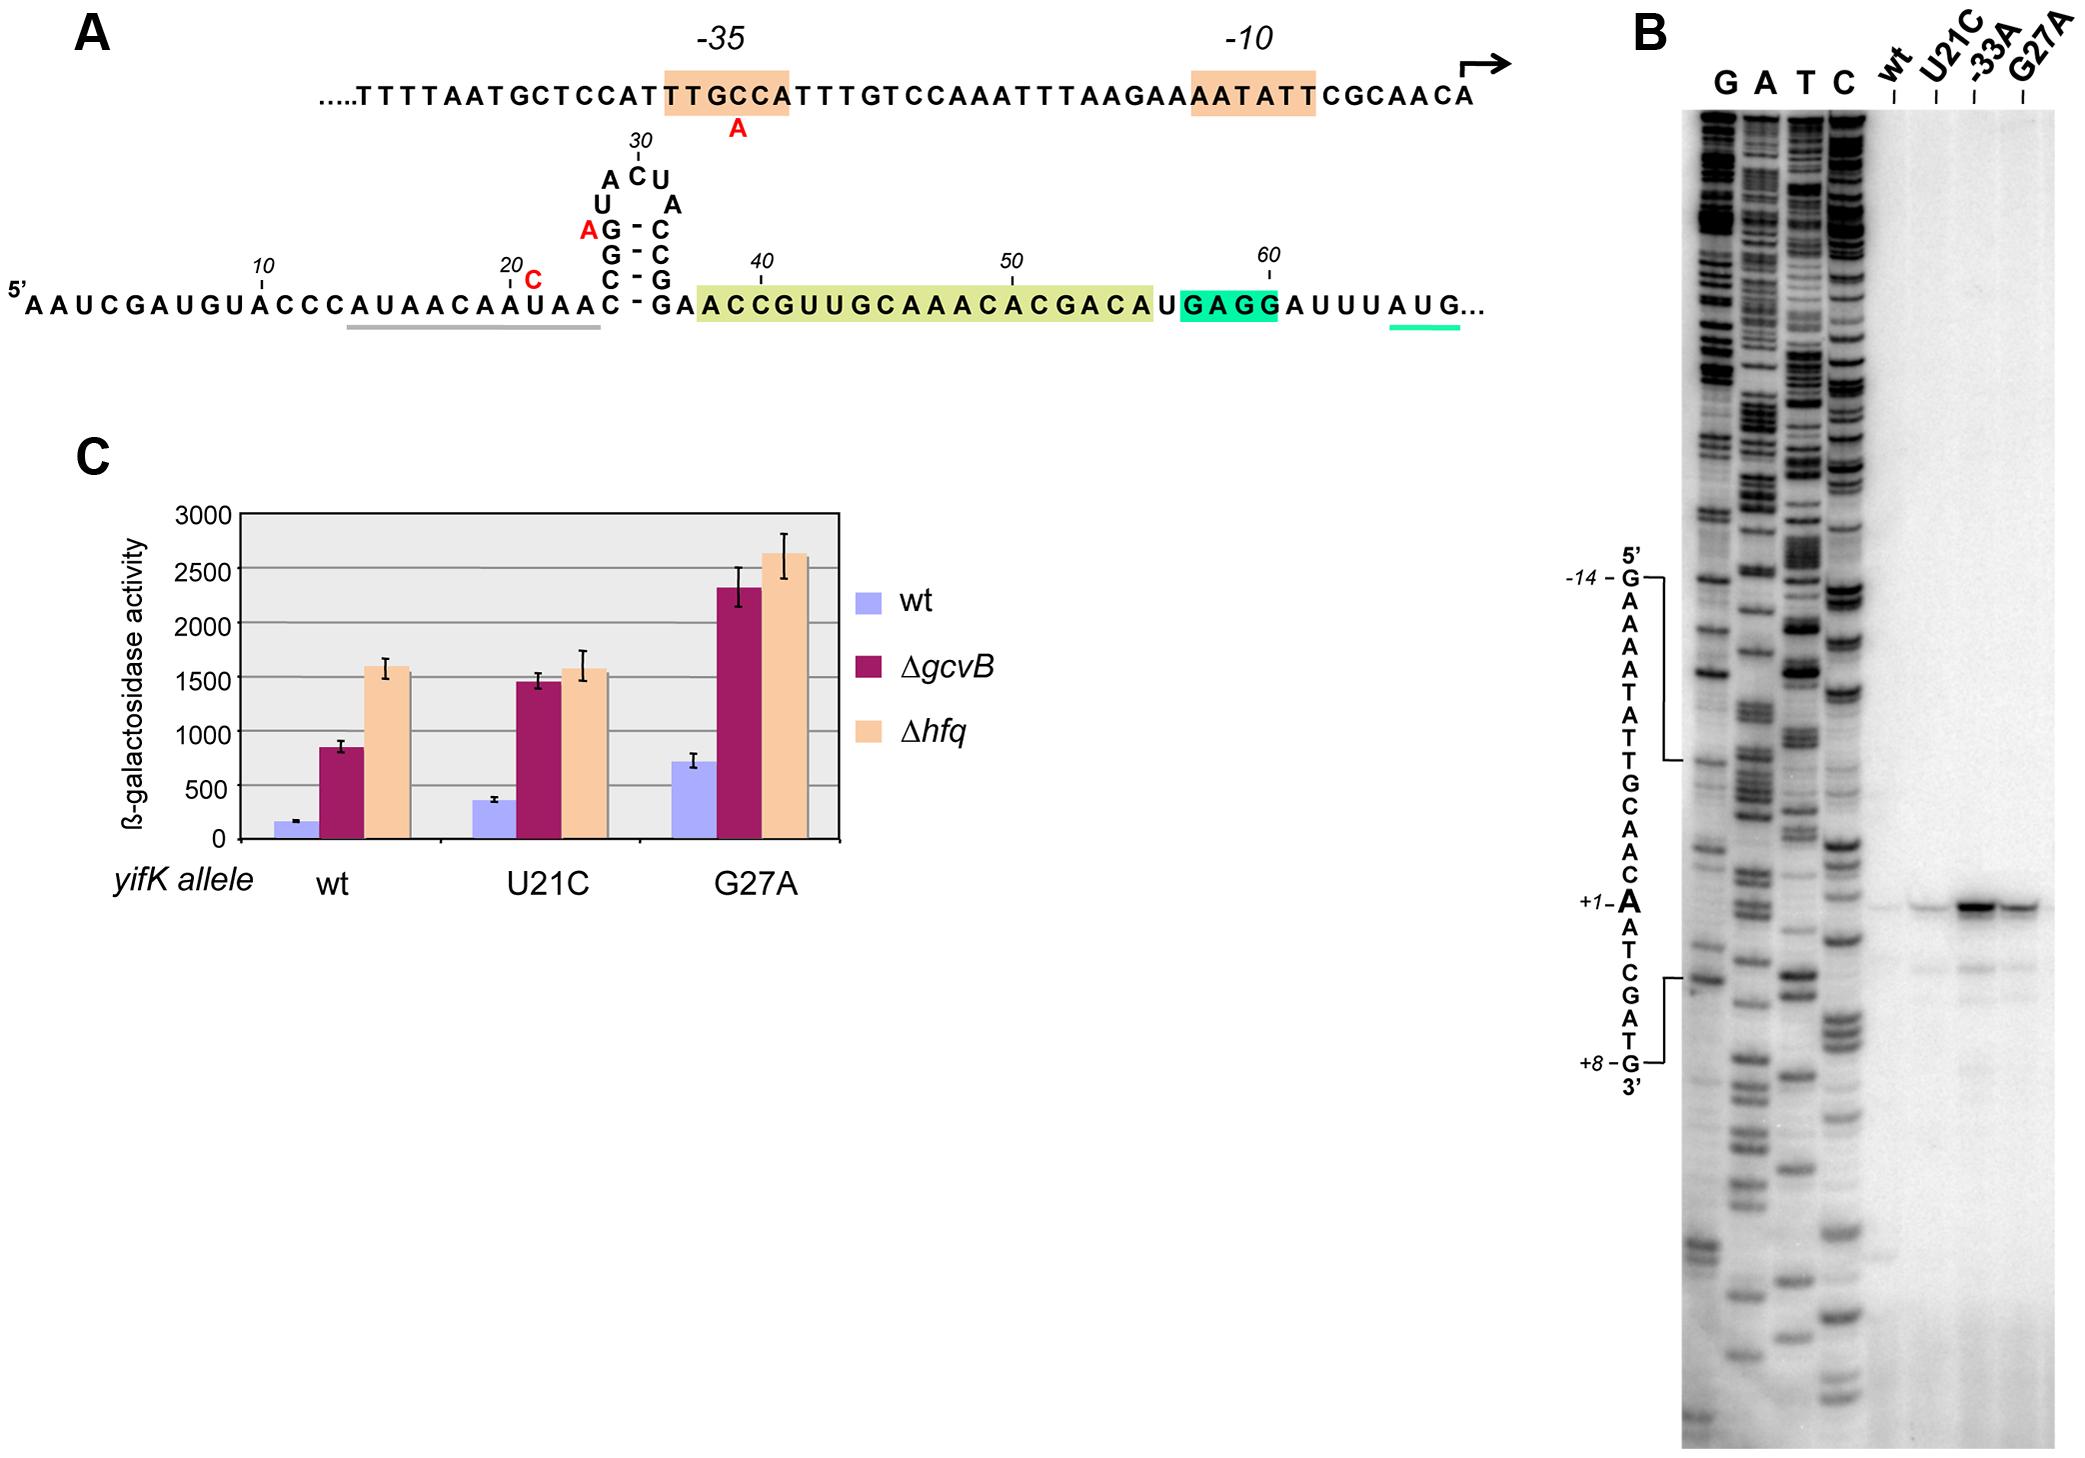 Characterization and mutational analysis of the leader region of the <i>yifK</i> gene.